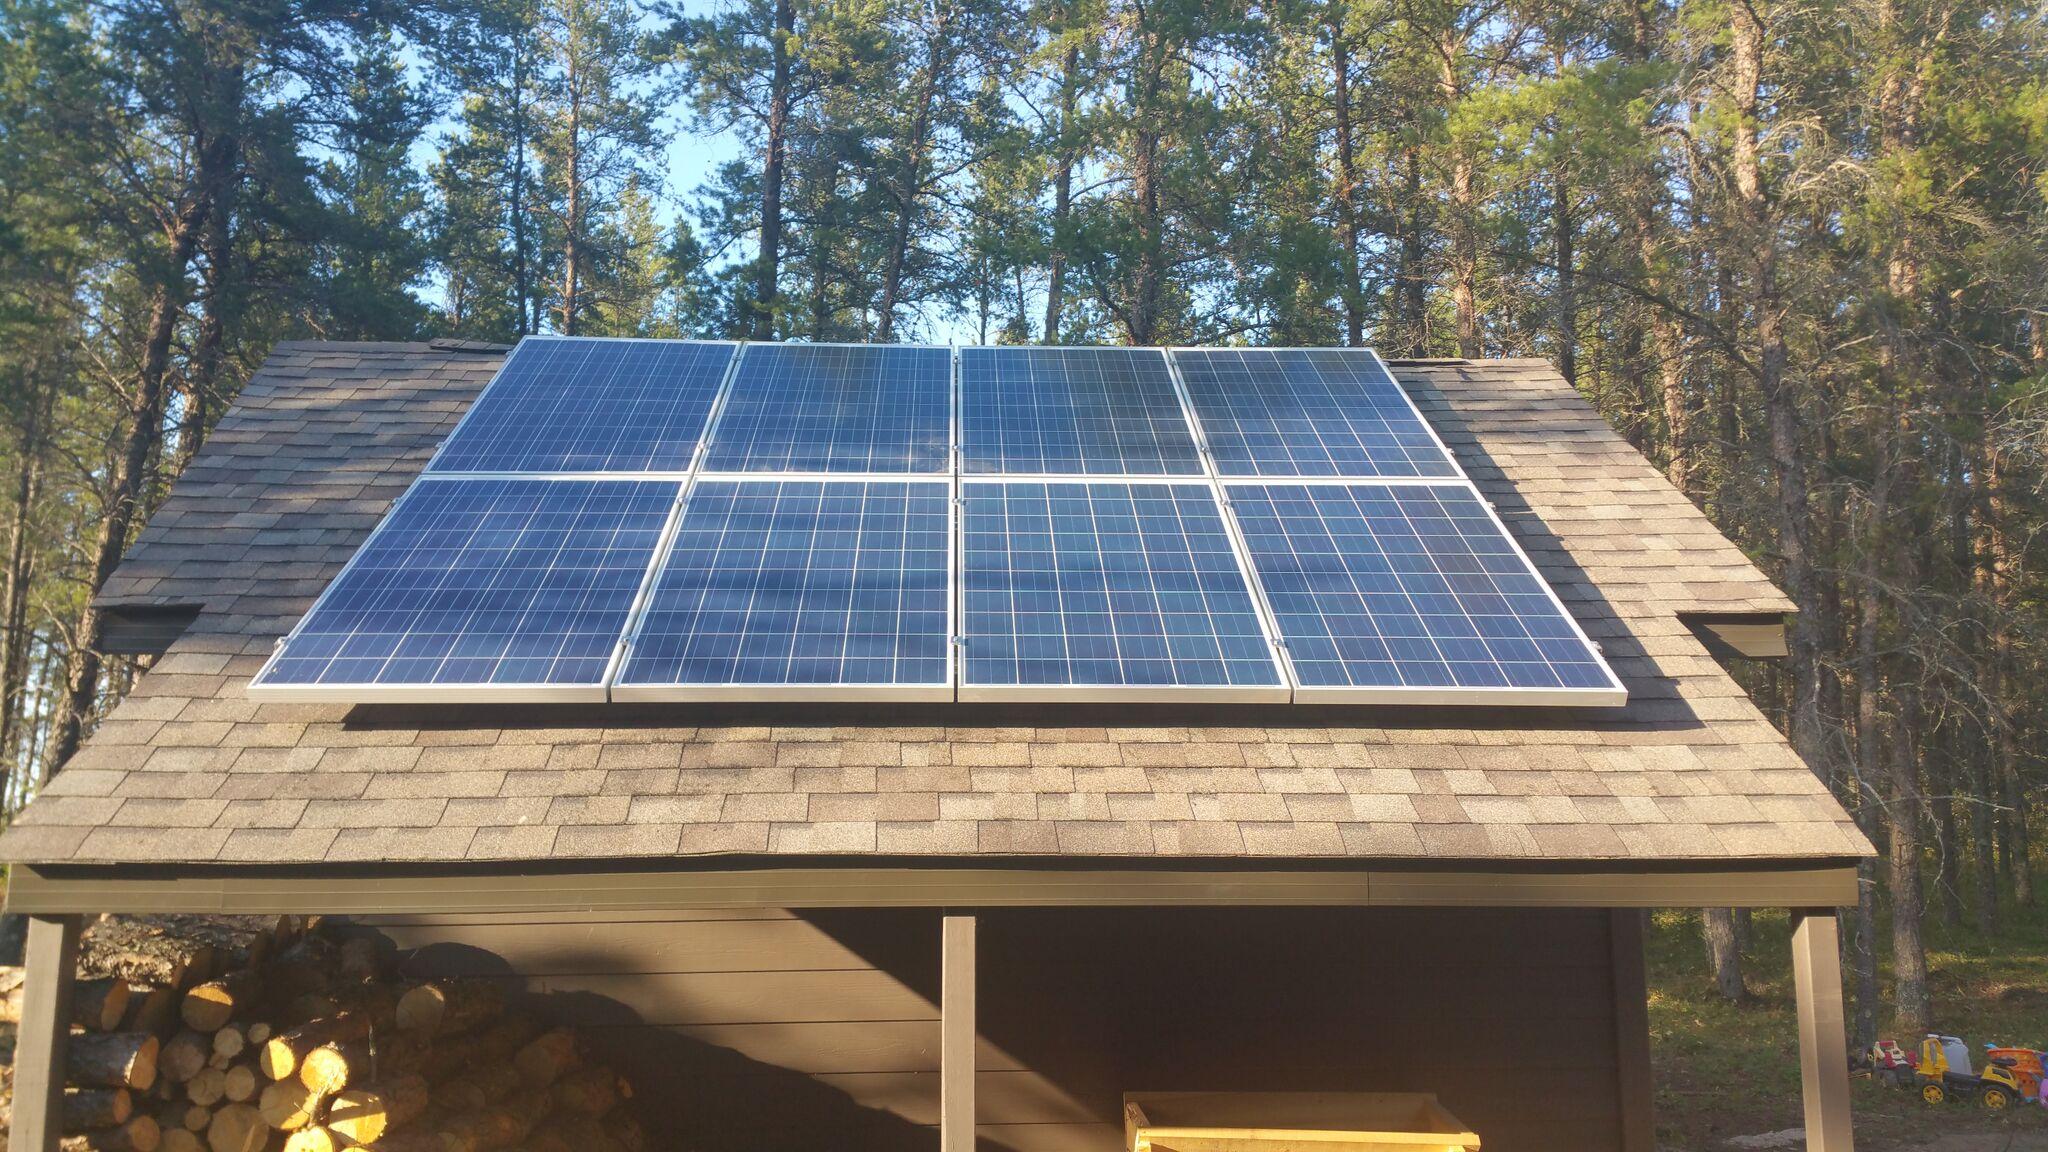 Og 3 9 Odin Package 3 9kw Solar 4 4kw Inverter 22kw